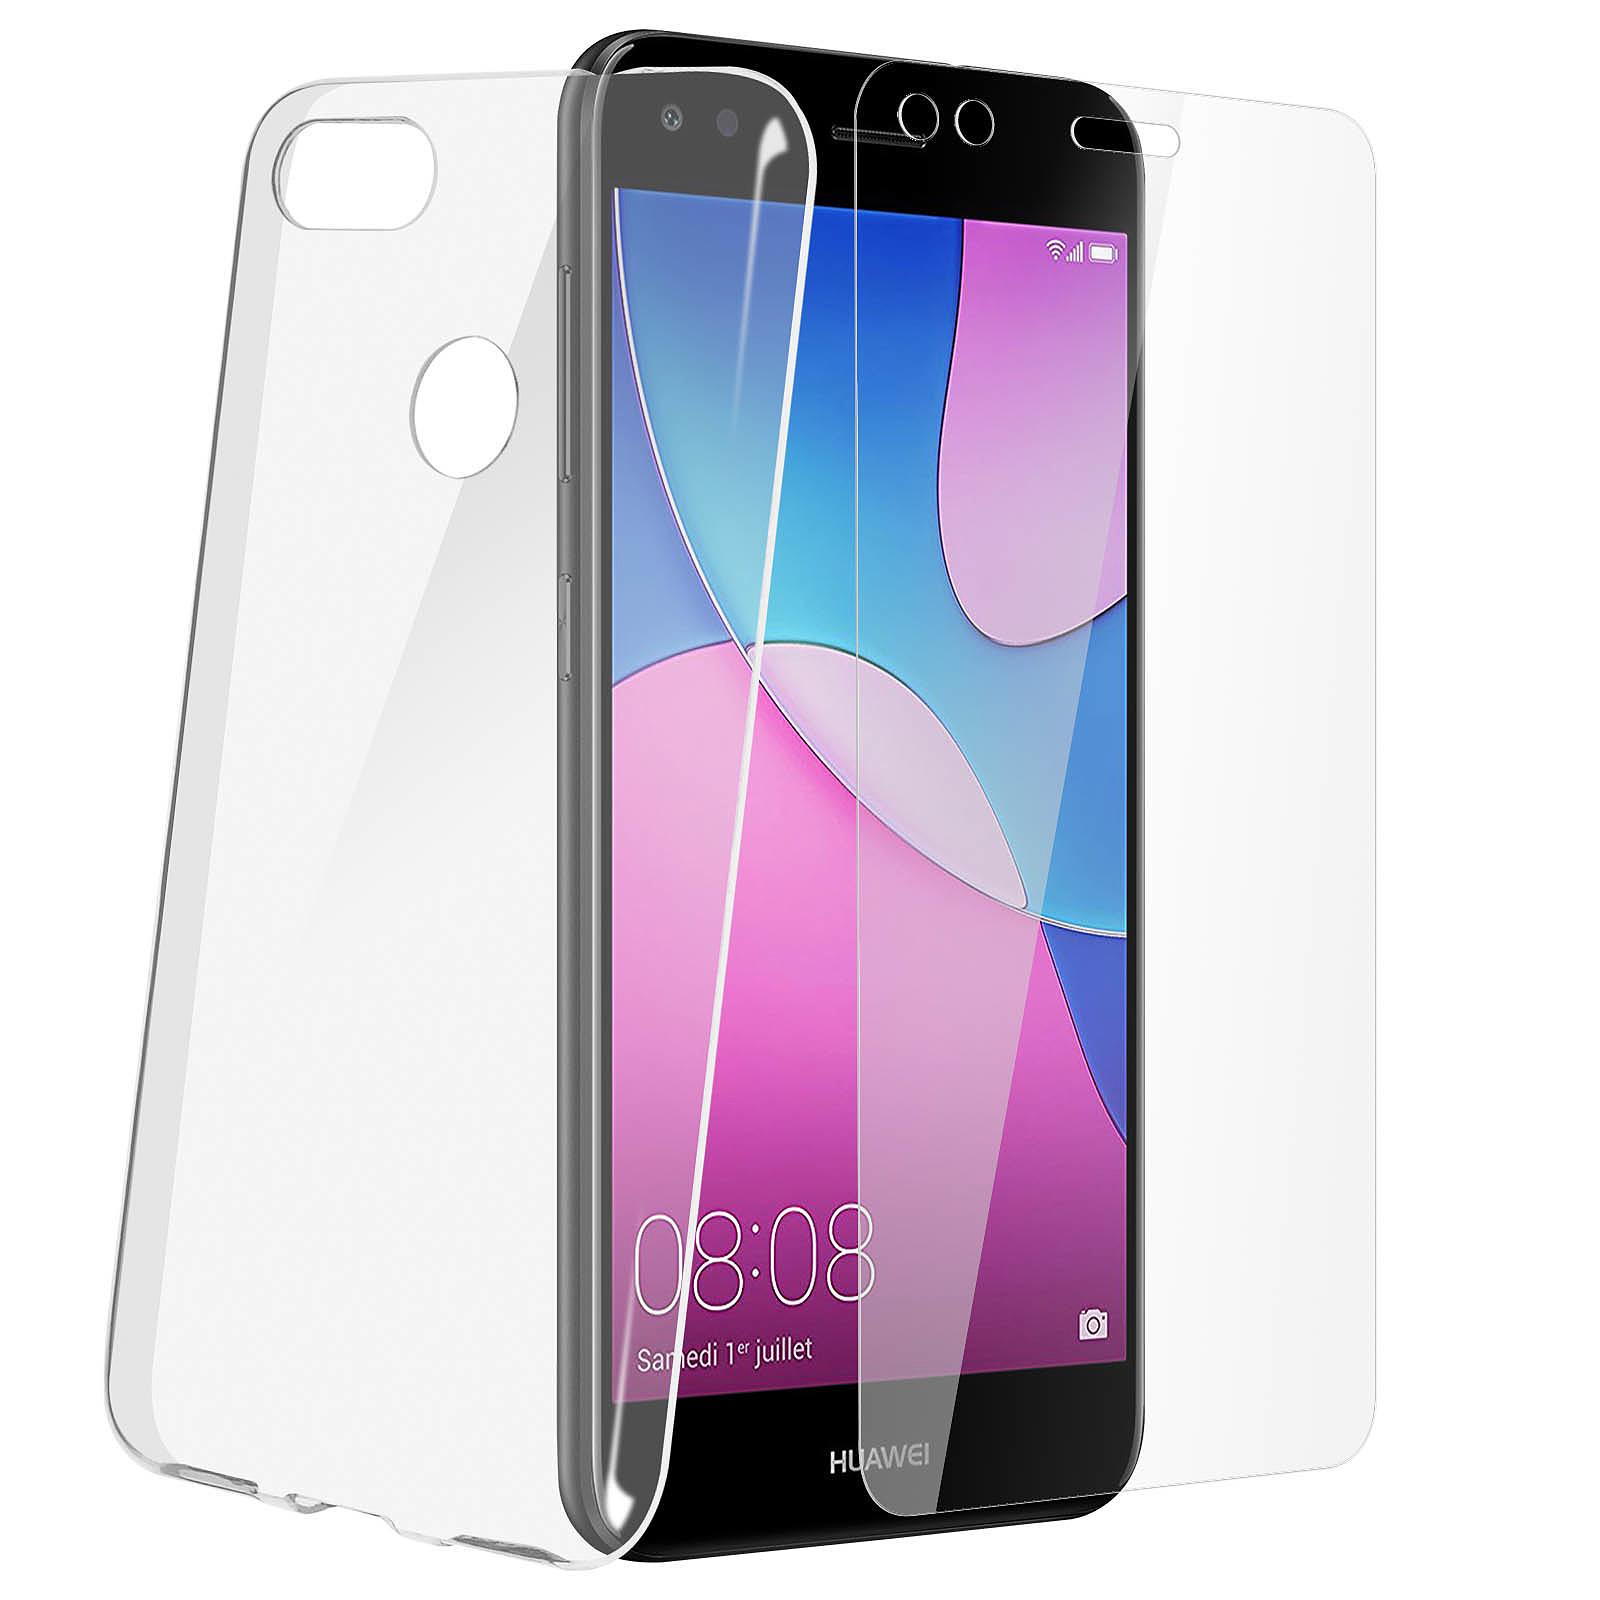 Avizar Coque Transparent pour Huawei Y6 Pro 2017 , Huawei P9 lite mini